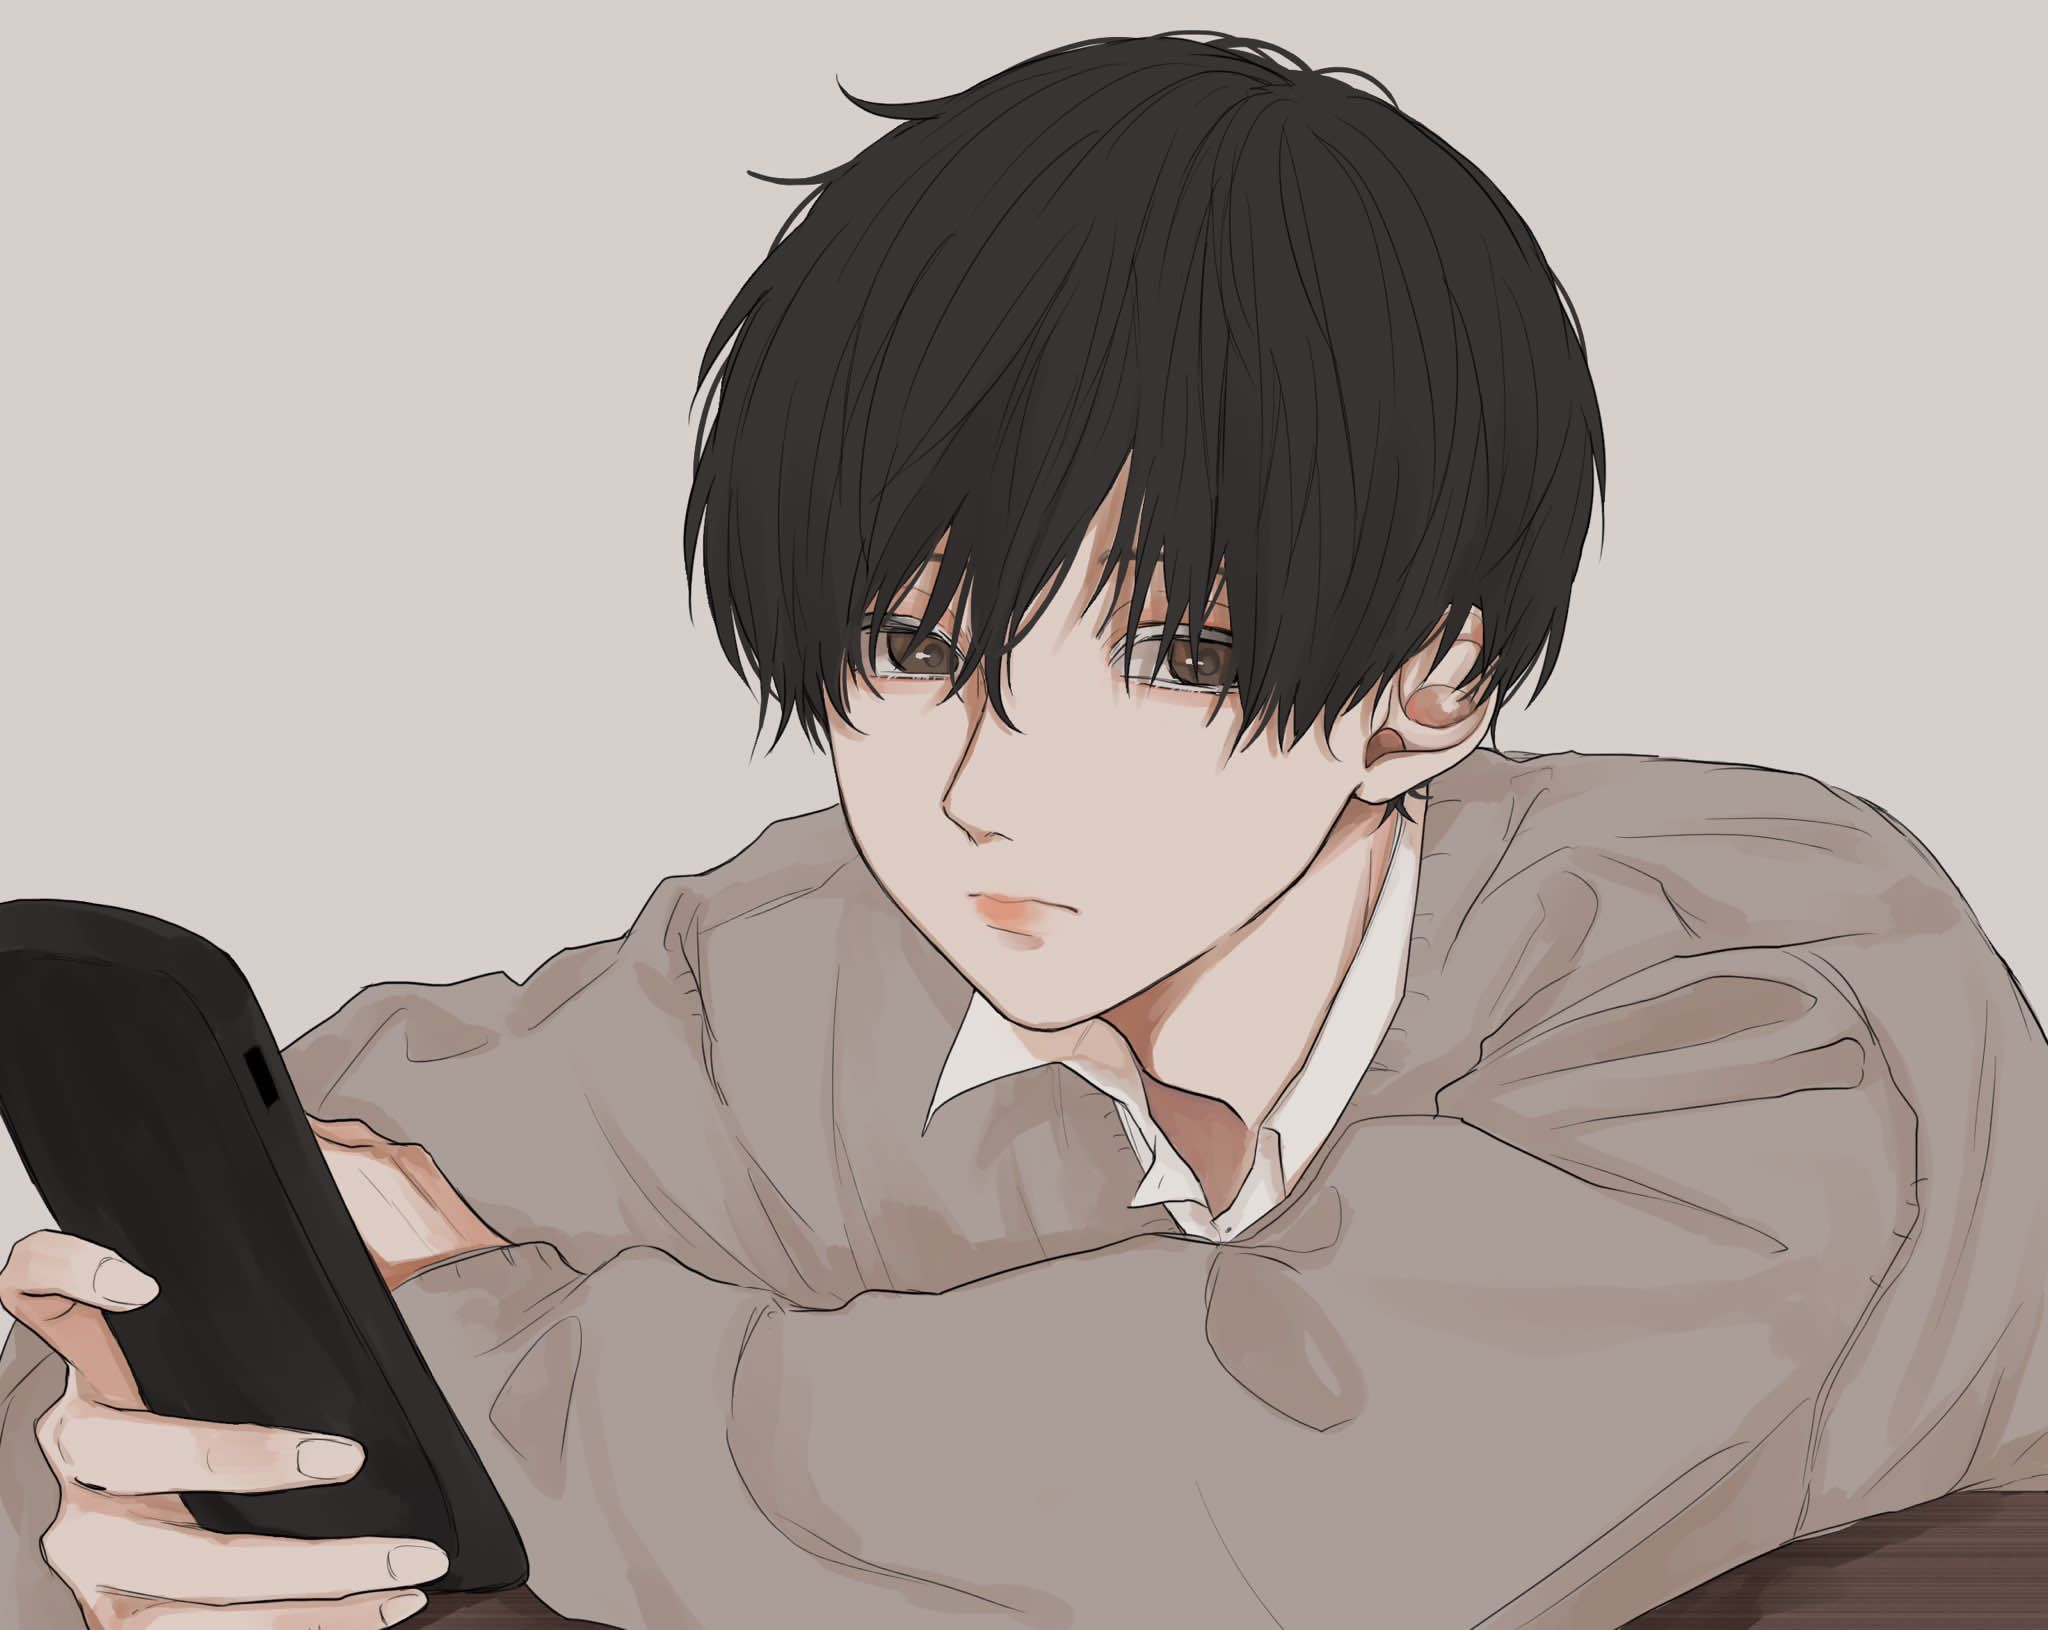 Anime Boys おしゃれまとめの人気アイデア Pinterest Hana Okumura イラスト マッシュ イラスト イケメン イラスト フリー